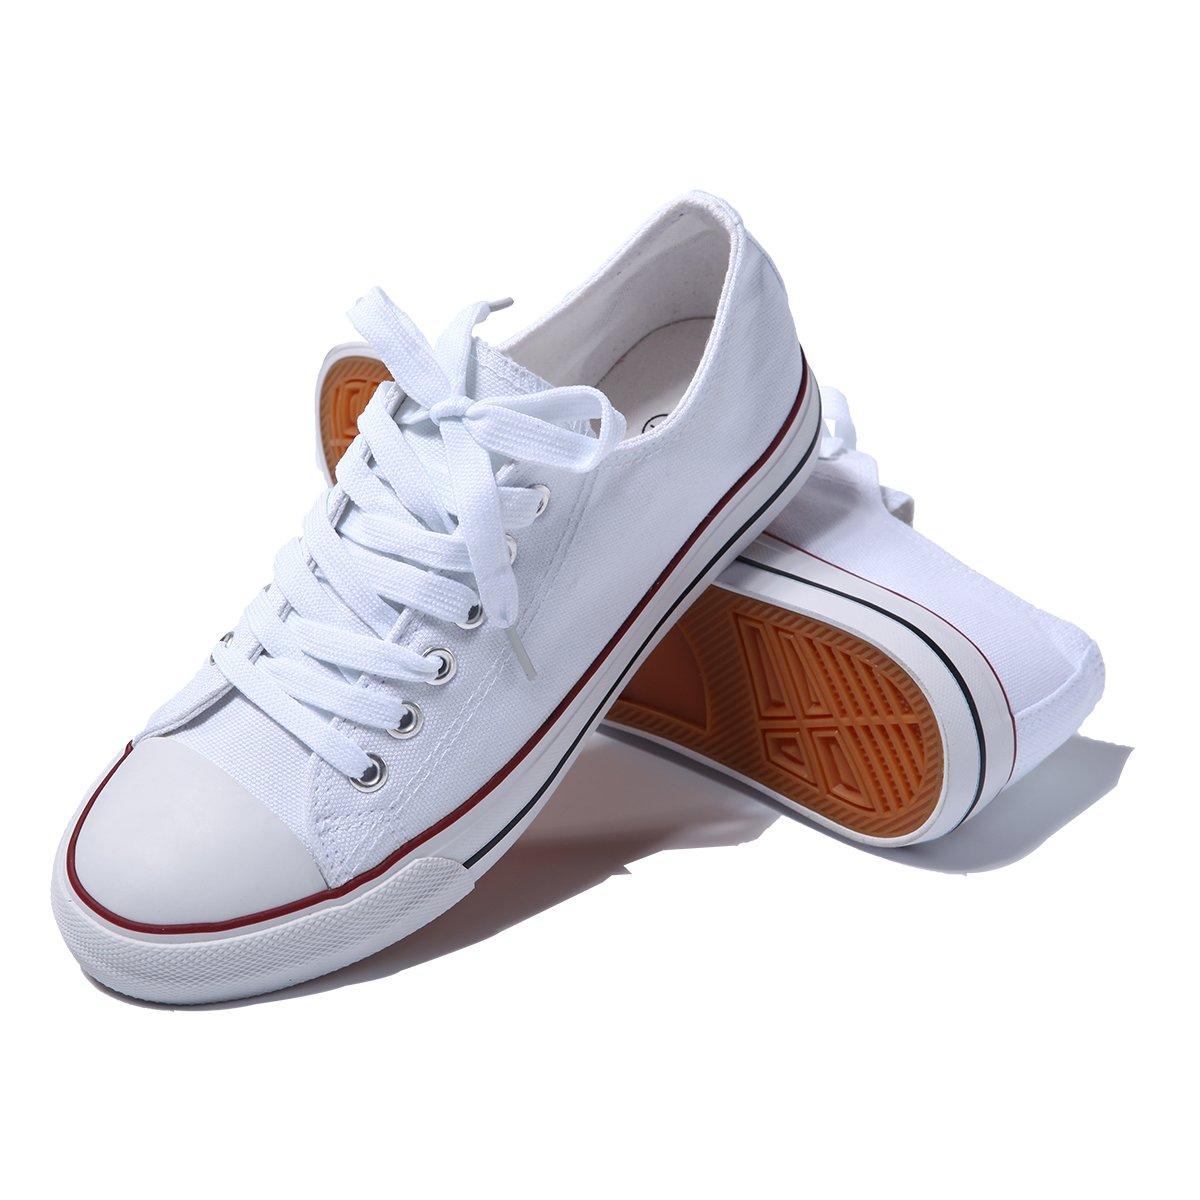 AOMAIS Womens Canvas Shoes Sneaker Low Top Lace up Fashion Walking Shoes (US7, white1) … by AOMAIS (Image #1)